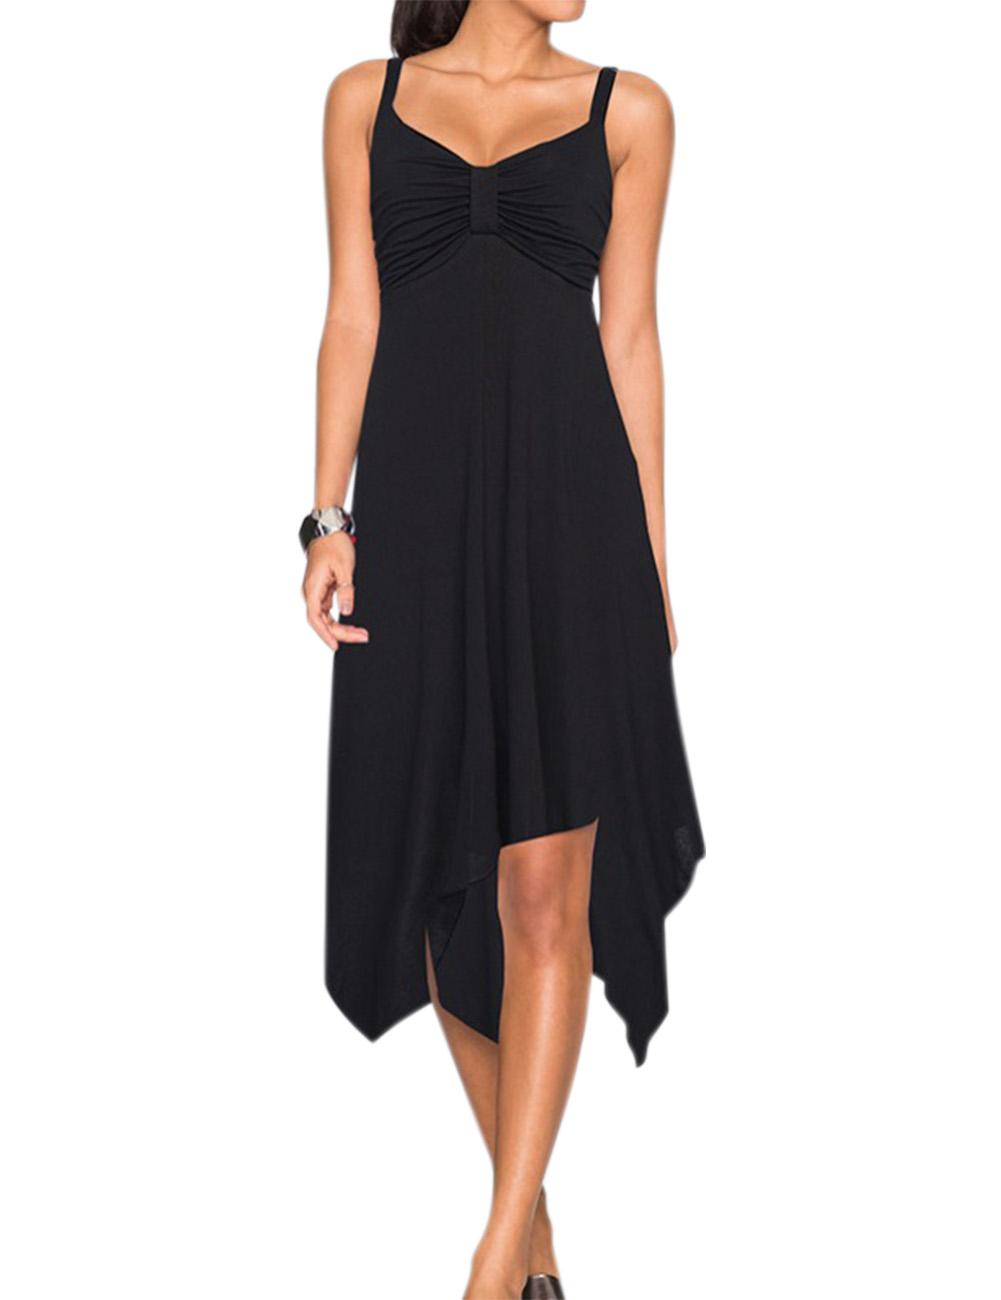 Liebeye Women's Casual Spaghetti Strap Ruched Asymmetrical A-line Sun Dress Black_XL